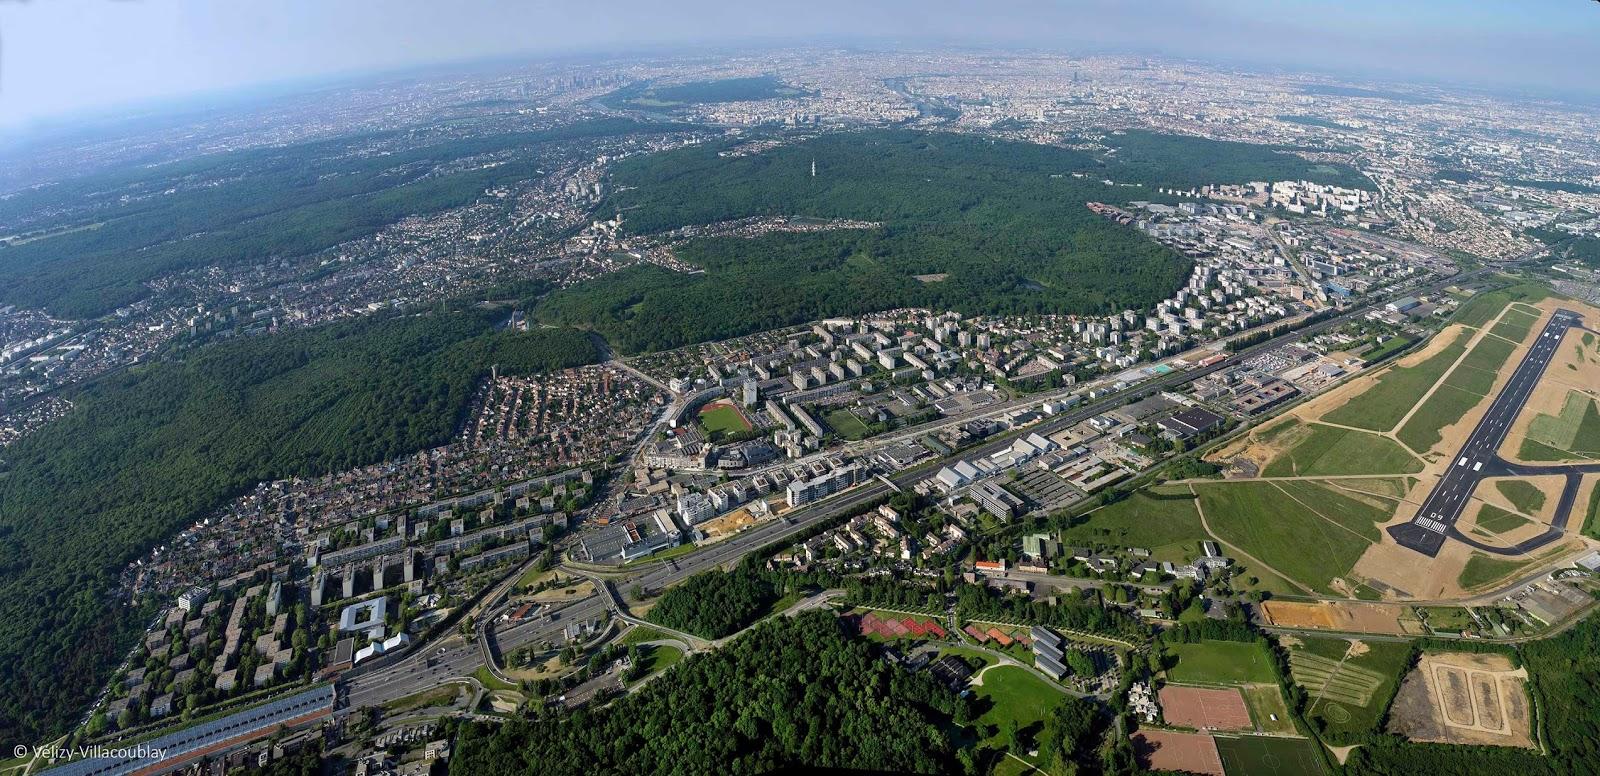 bordels paris Vélizy-Villacoublay